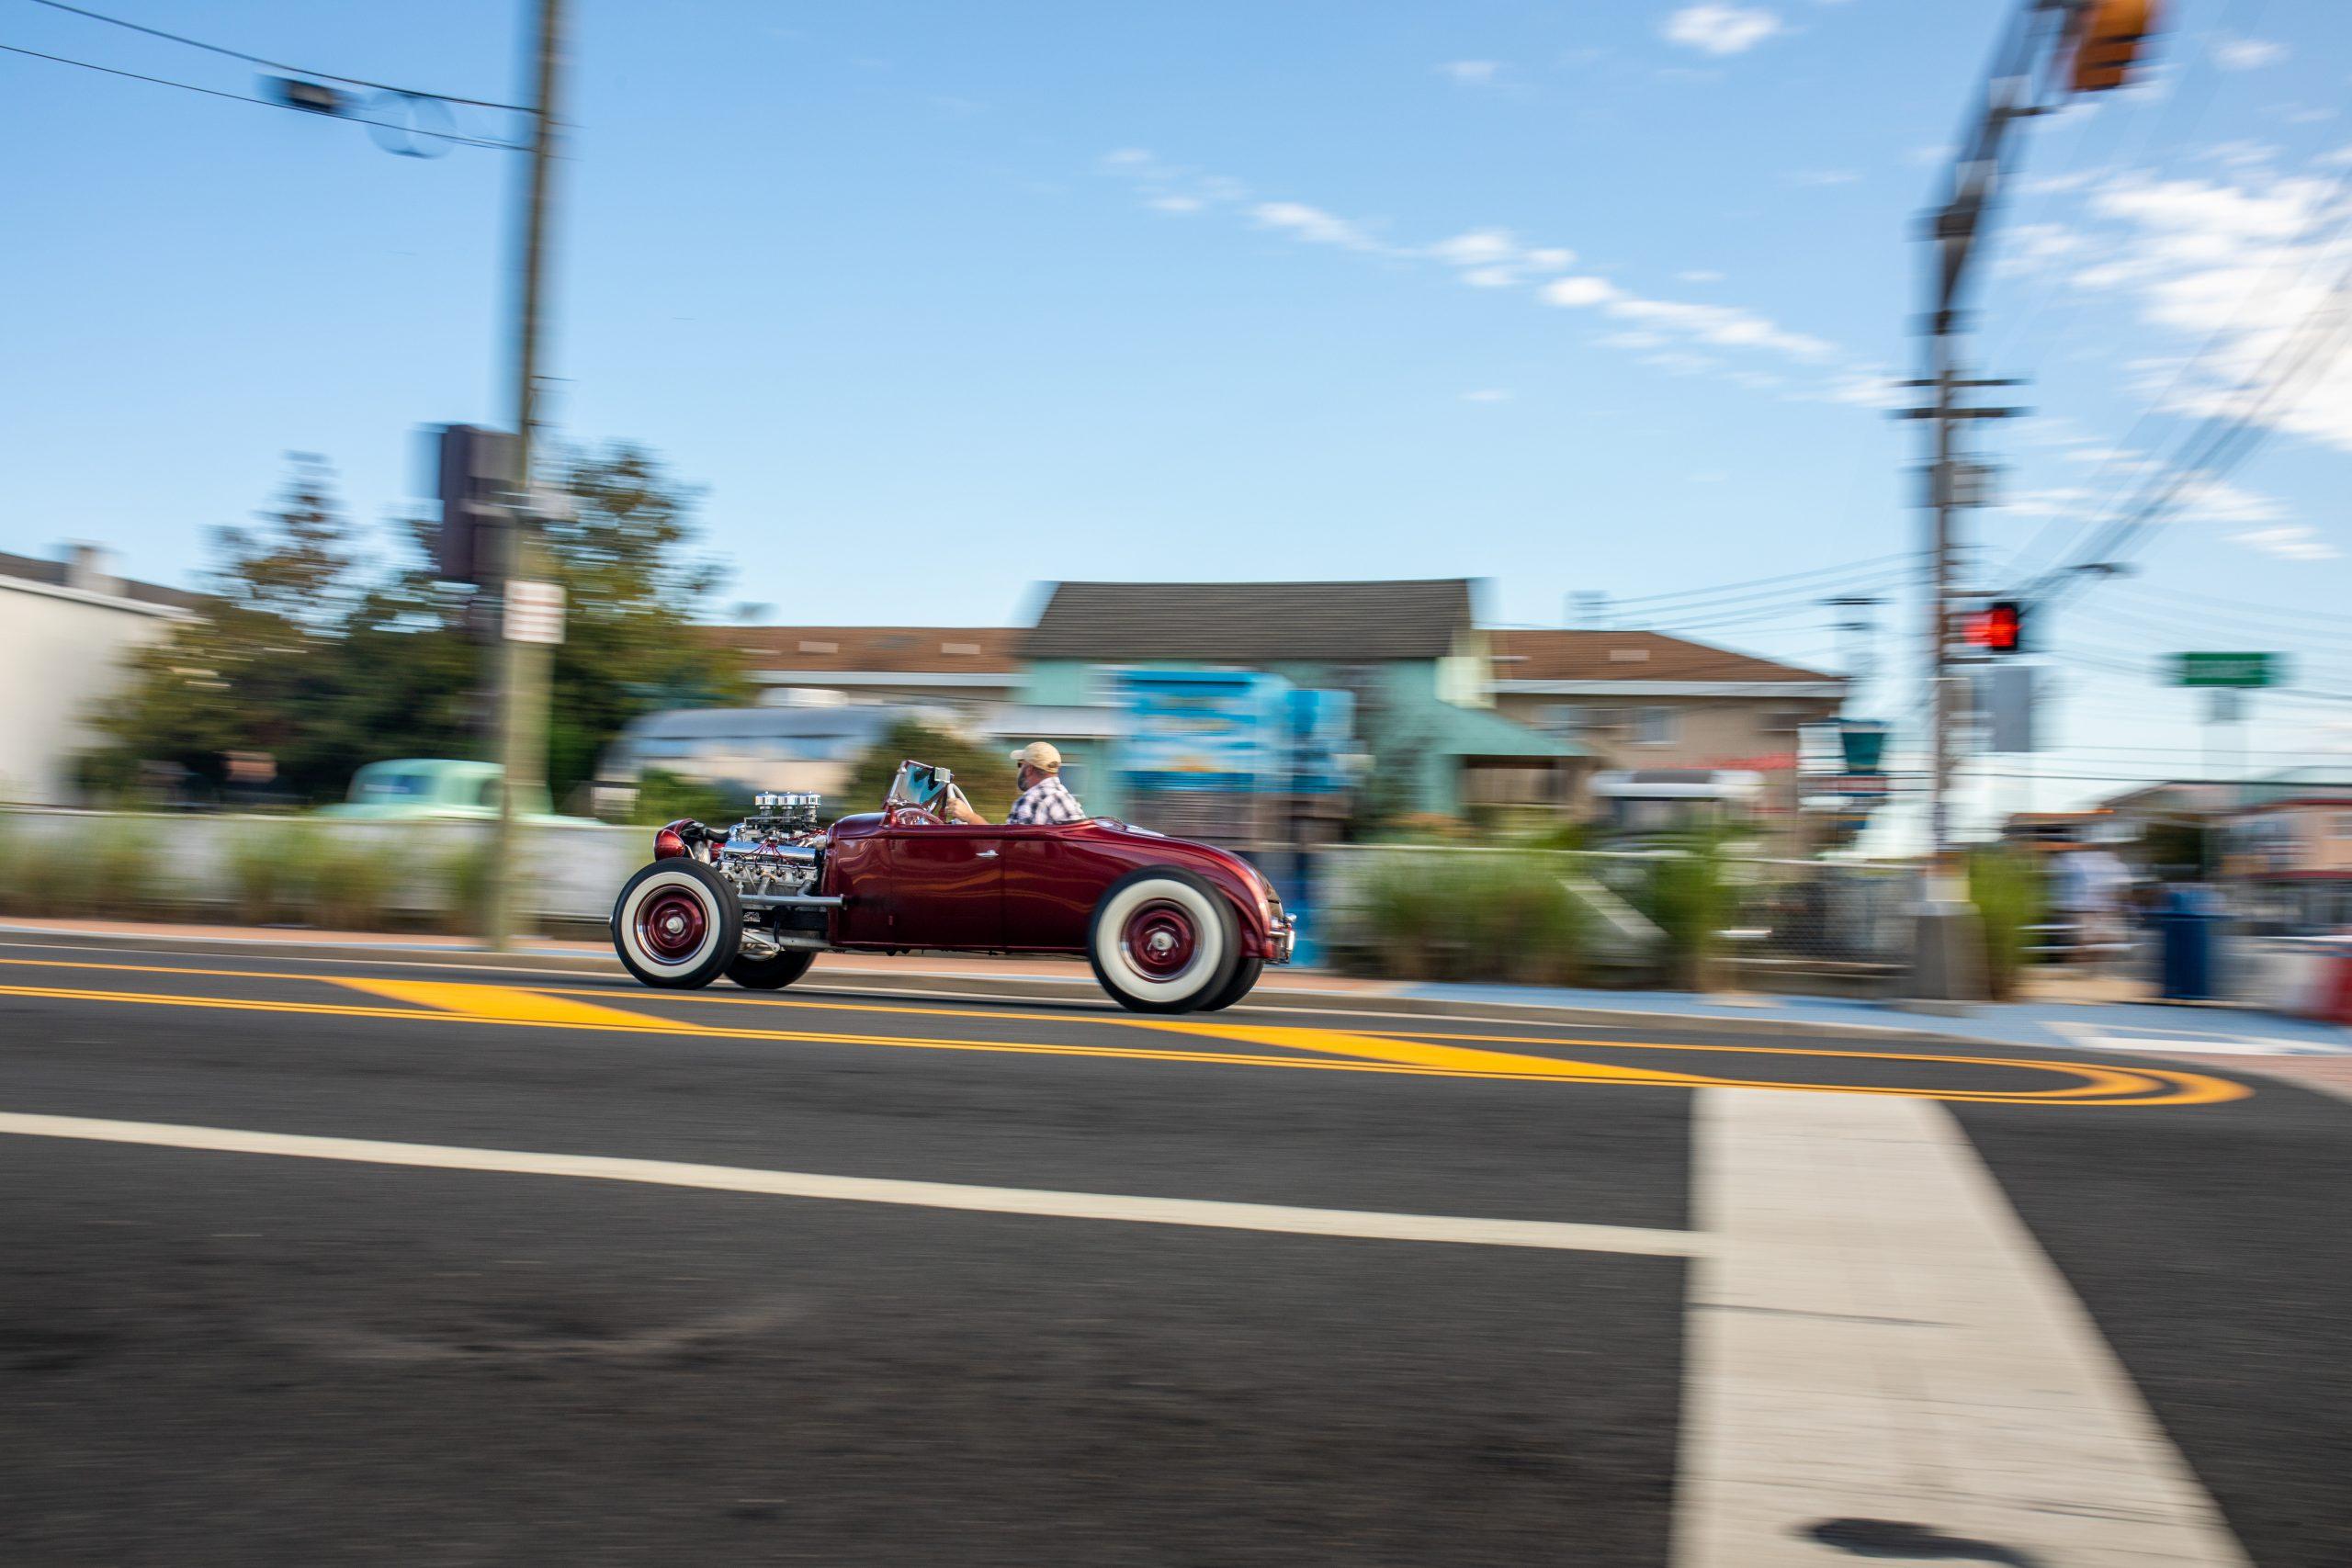 hot rod racer beach town street action